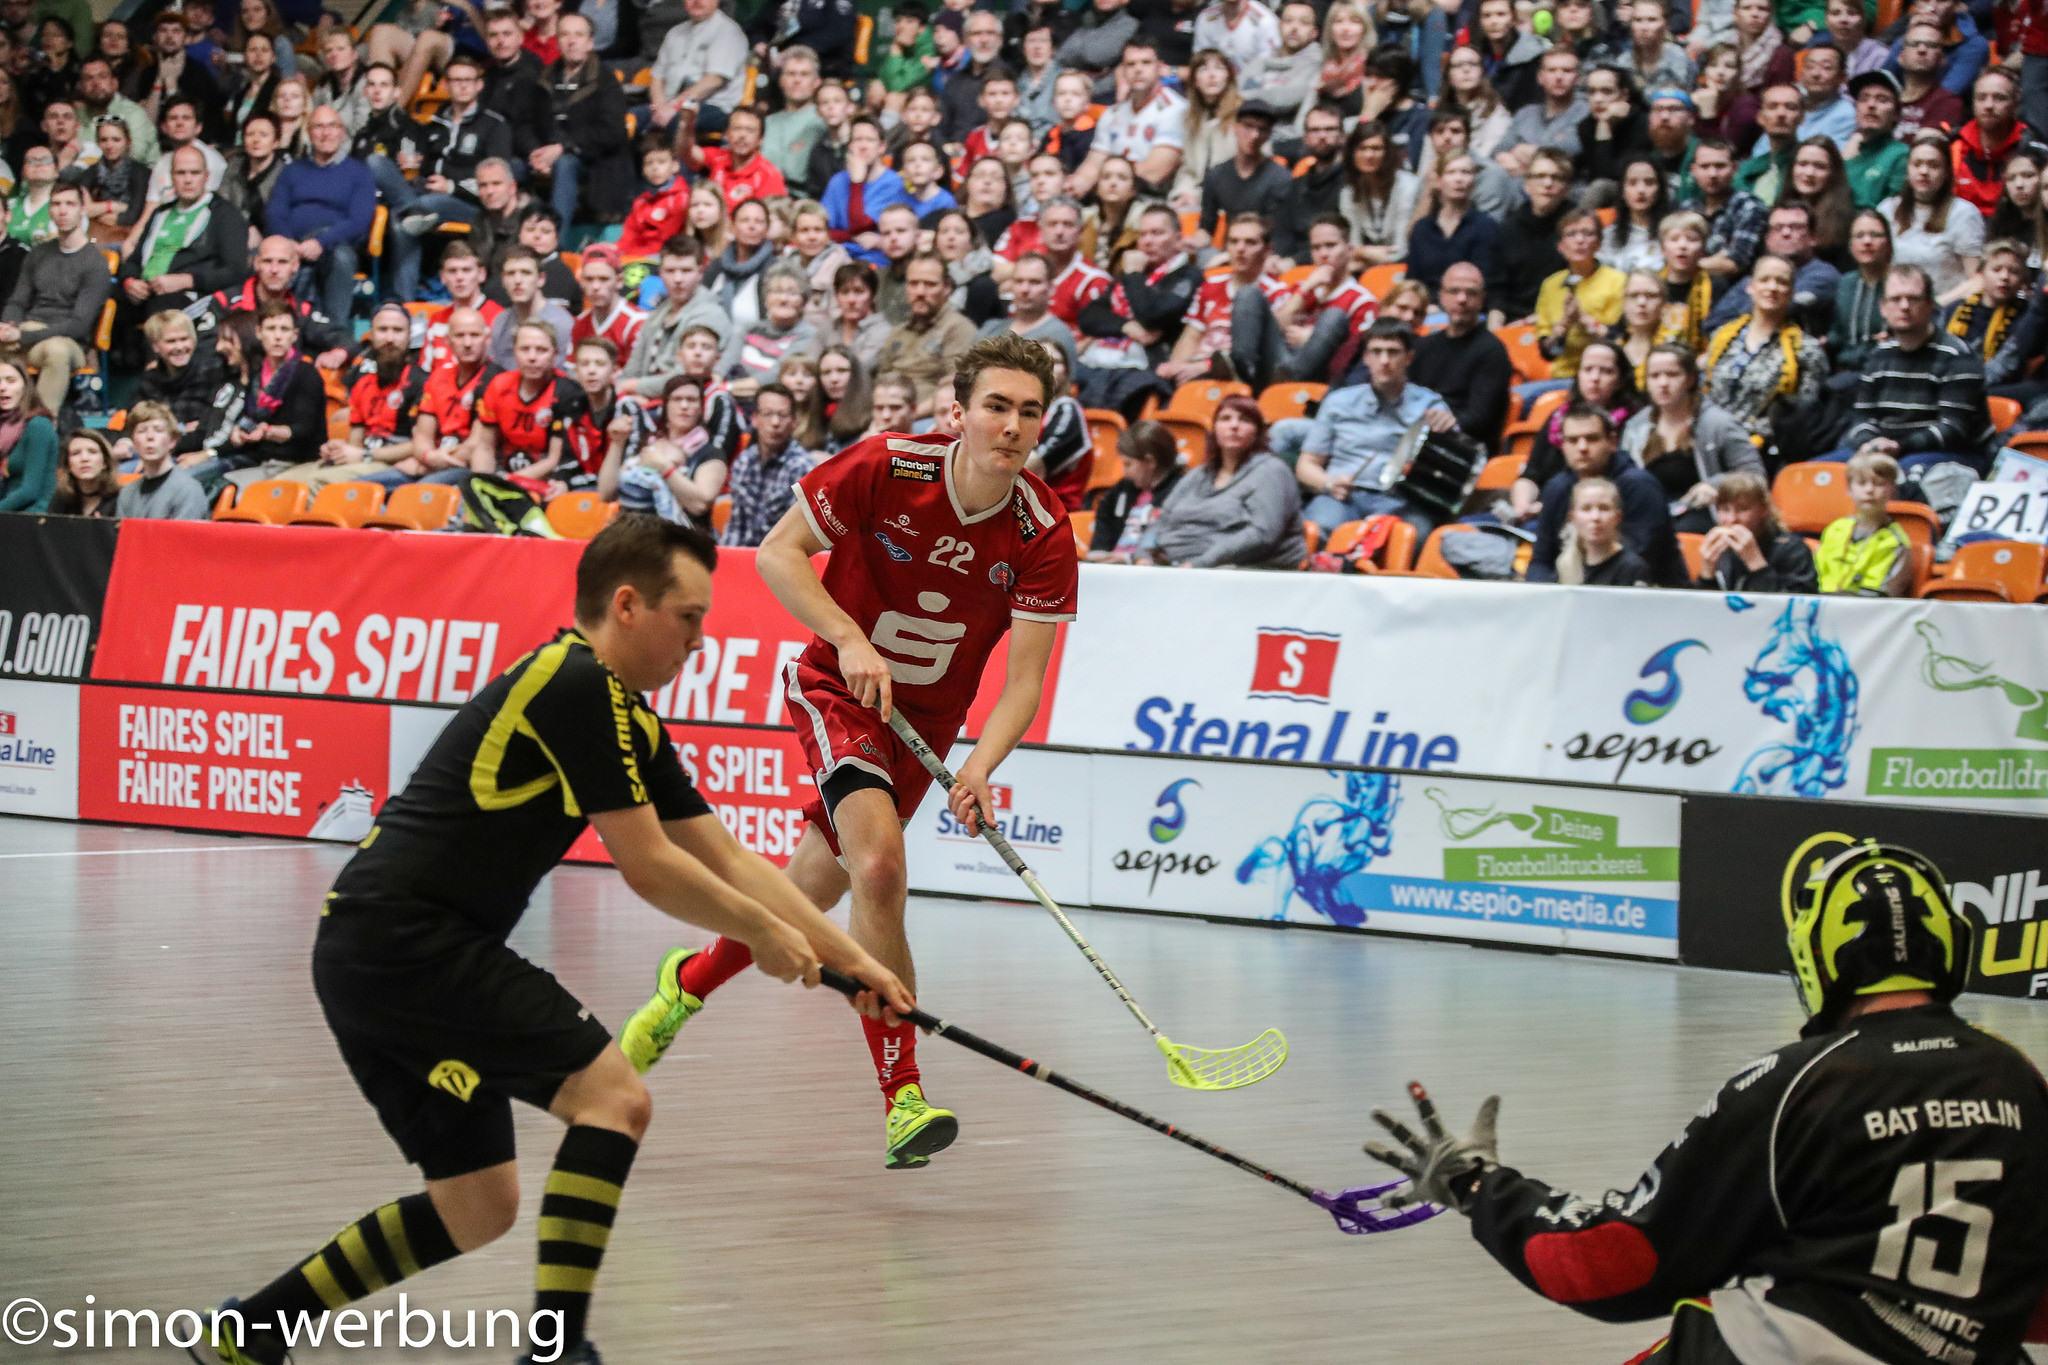 17 10 13 UHC vs Ebersgns VB